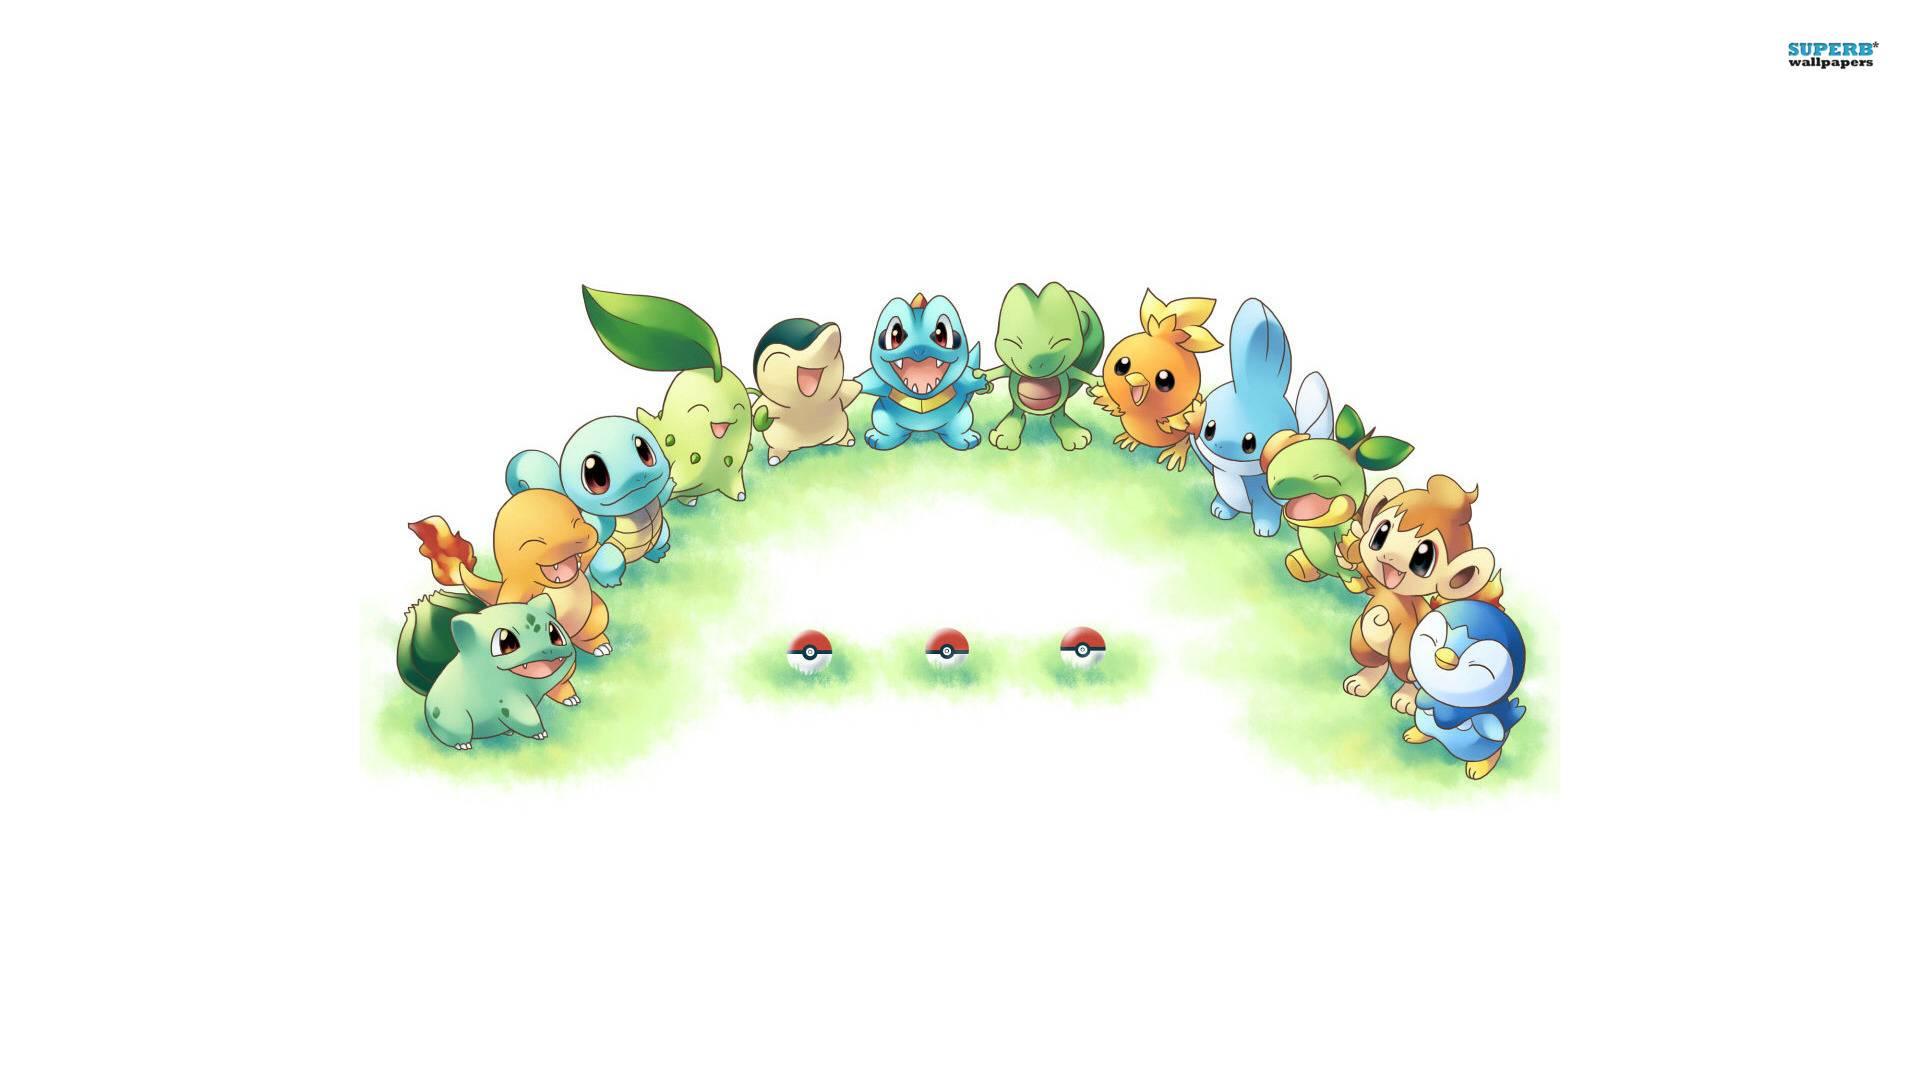 Pokemon Full Hd 壁纸 And 背景 1920x1080 Id 686170